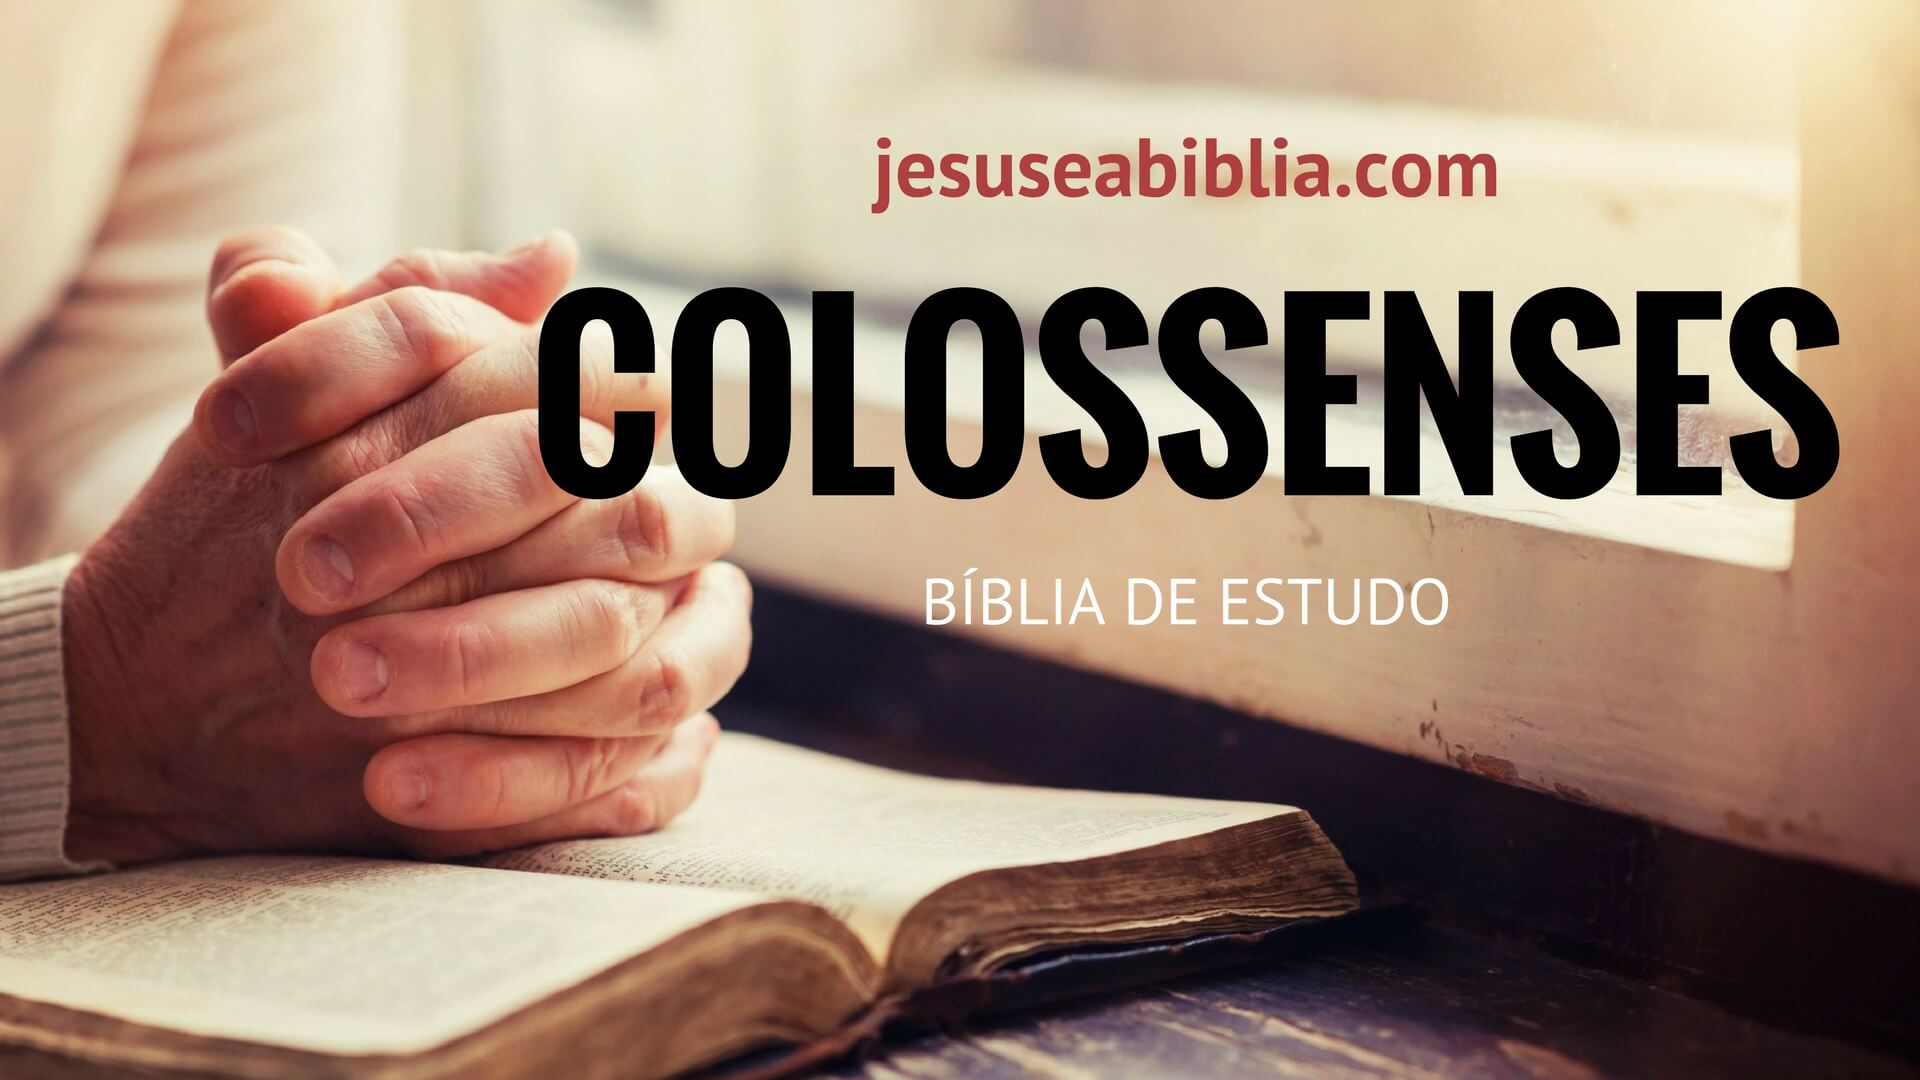 Colossenses - Bíblia de Estudo Online